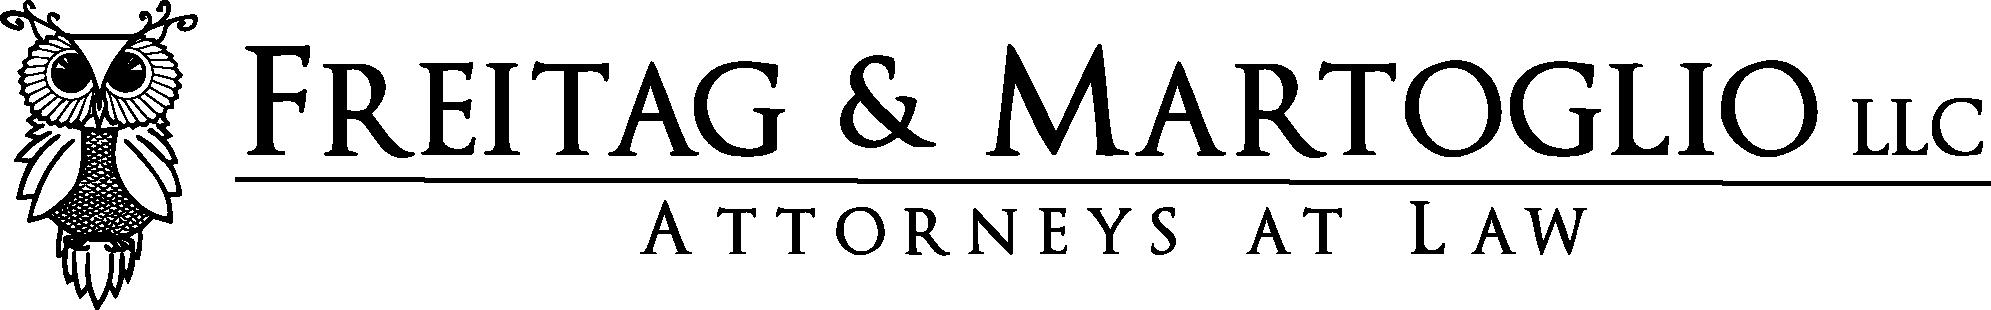 F&M_bw_logo.png